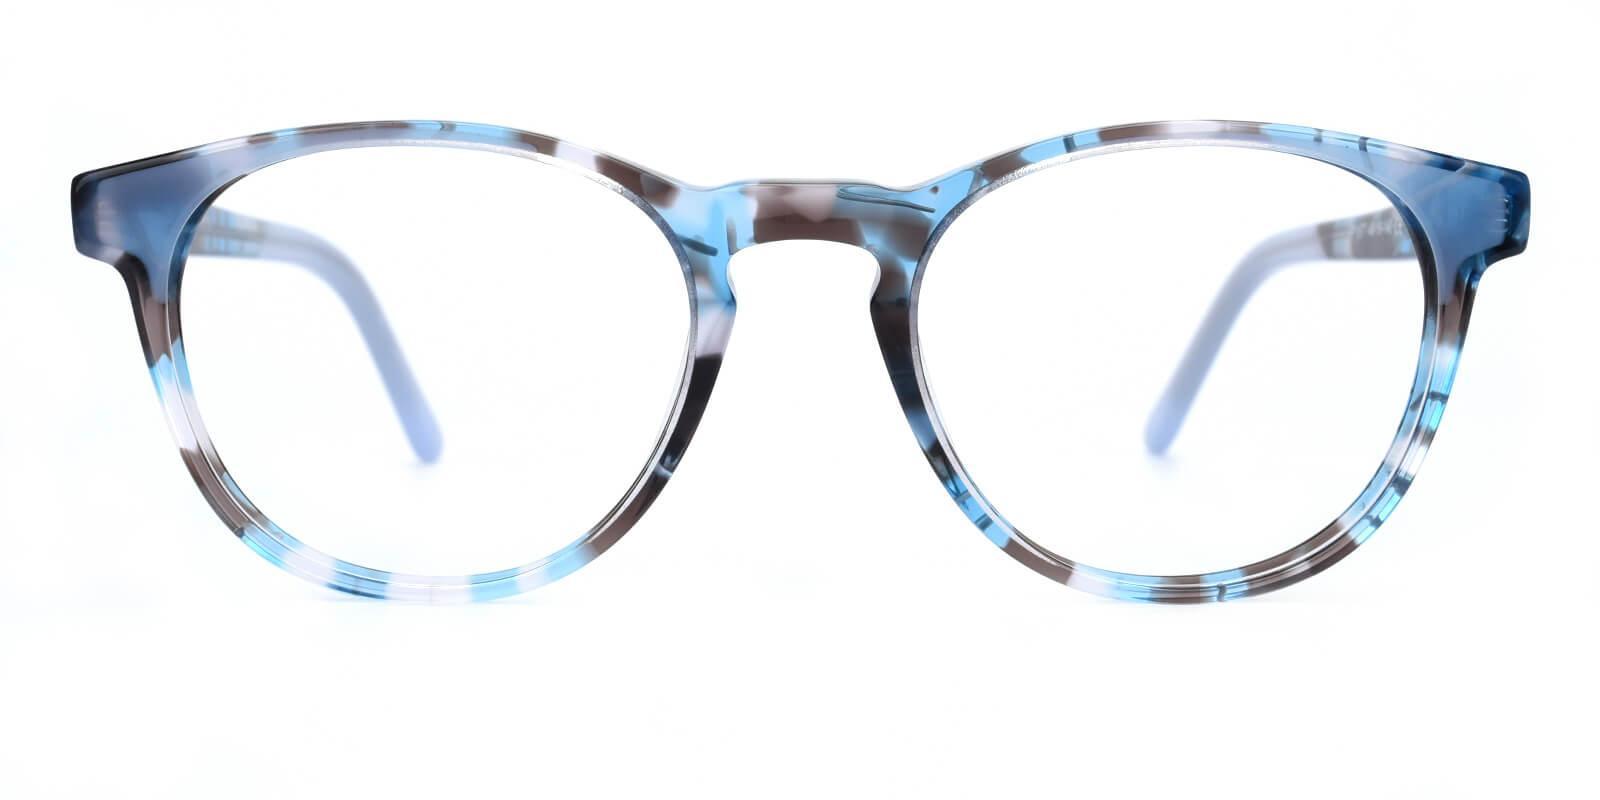 Debbine-Blue-Oval-Acetate-Eyeglasses-additional2